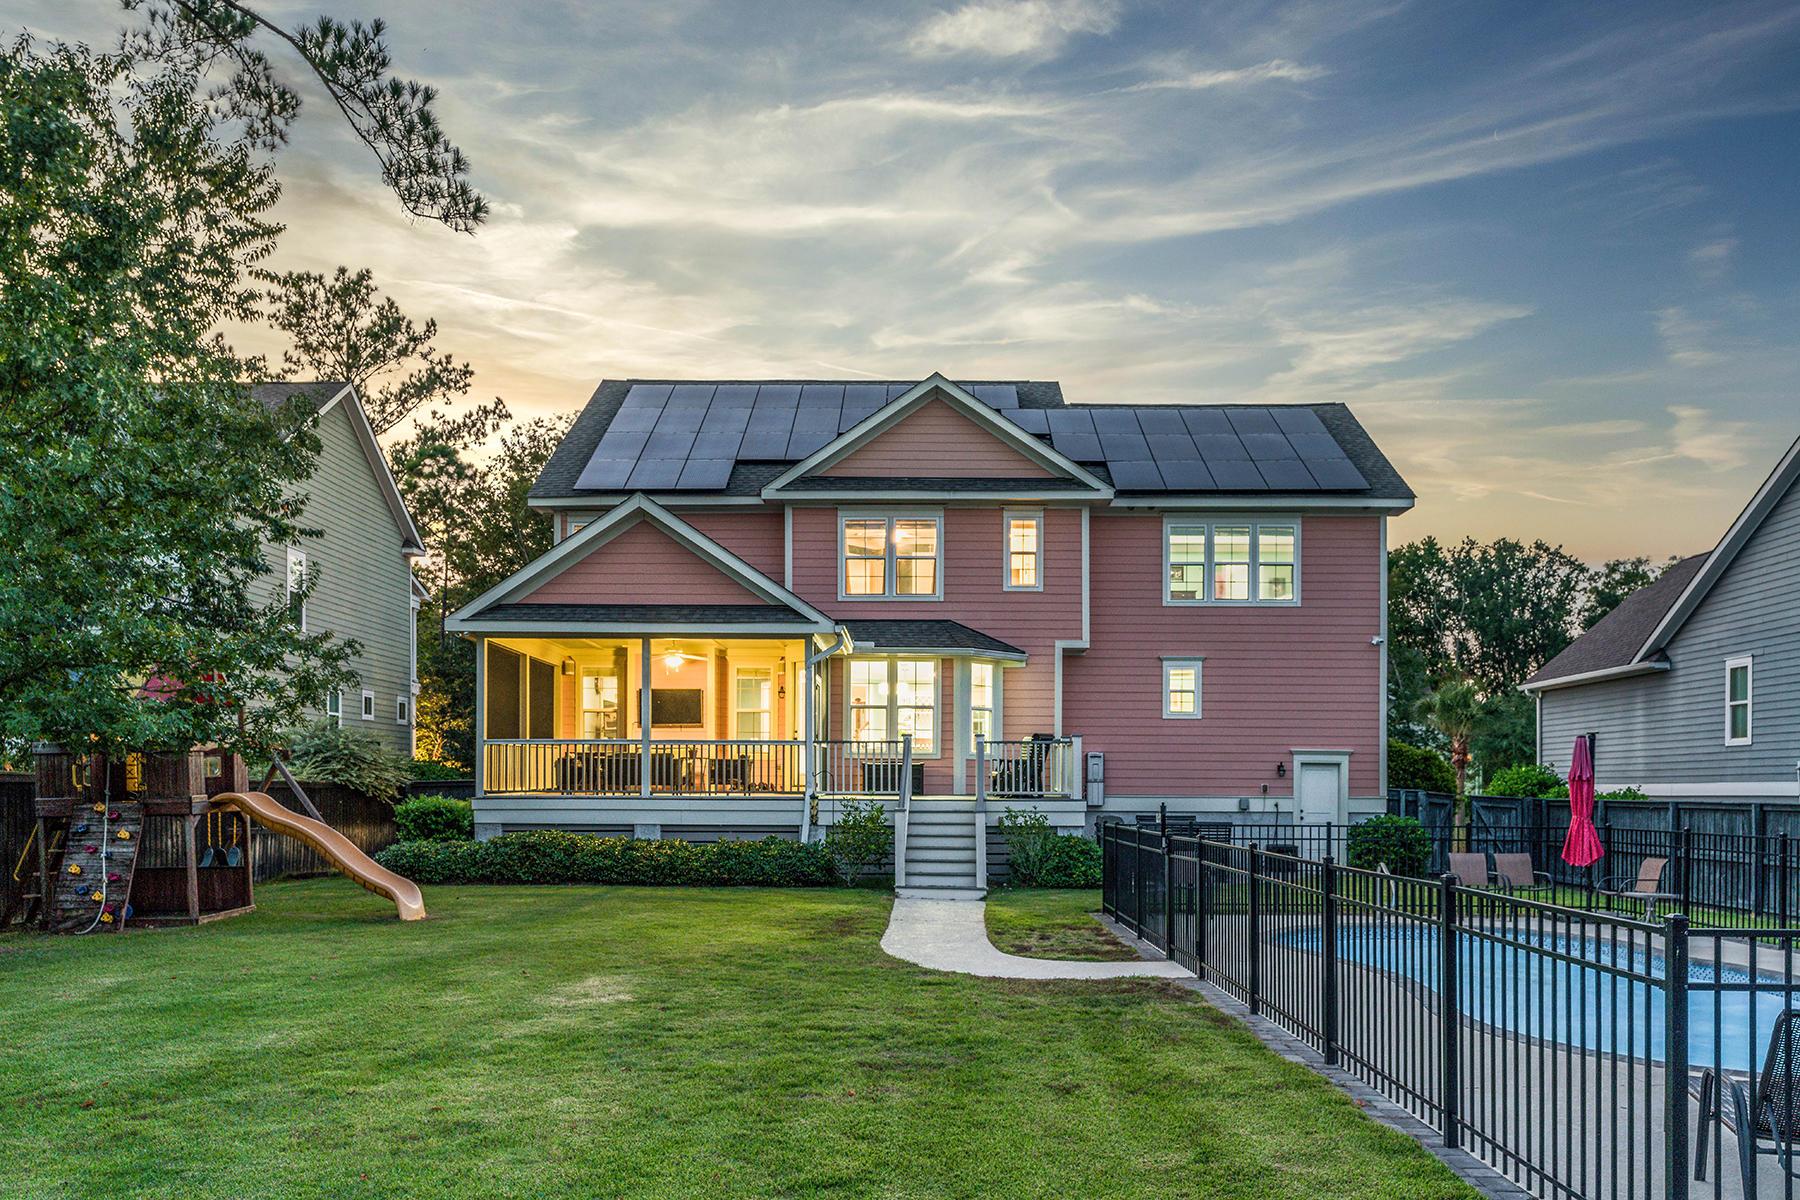 Scotts Creek Homes For Sale - 1389 Scotts Creek, Mount Pleasant, SC - 40